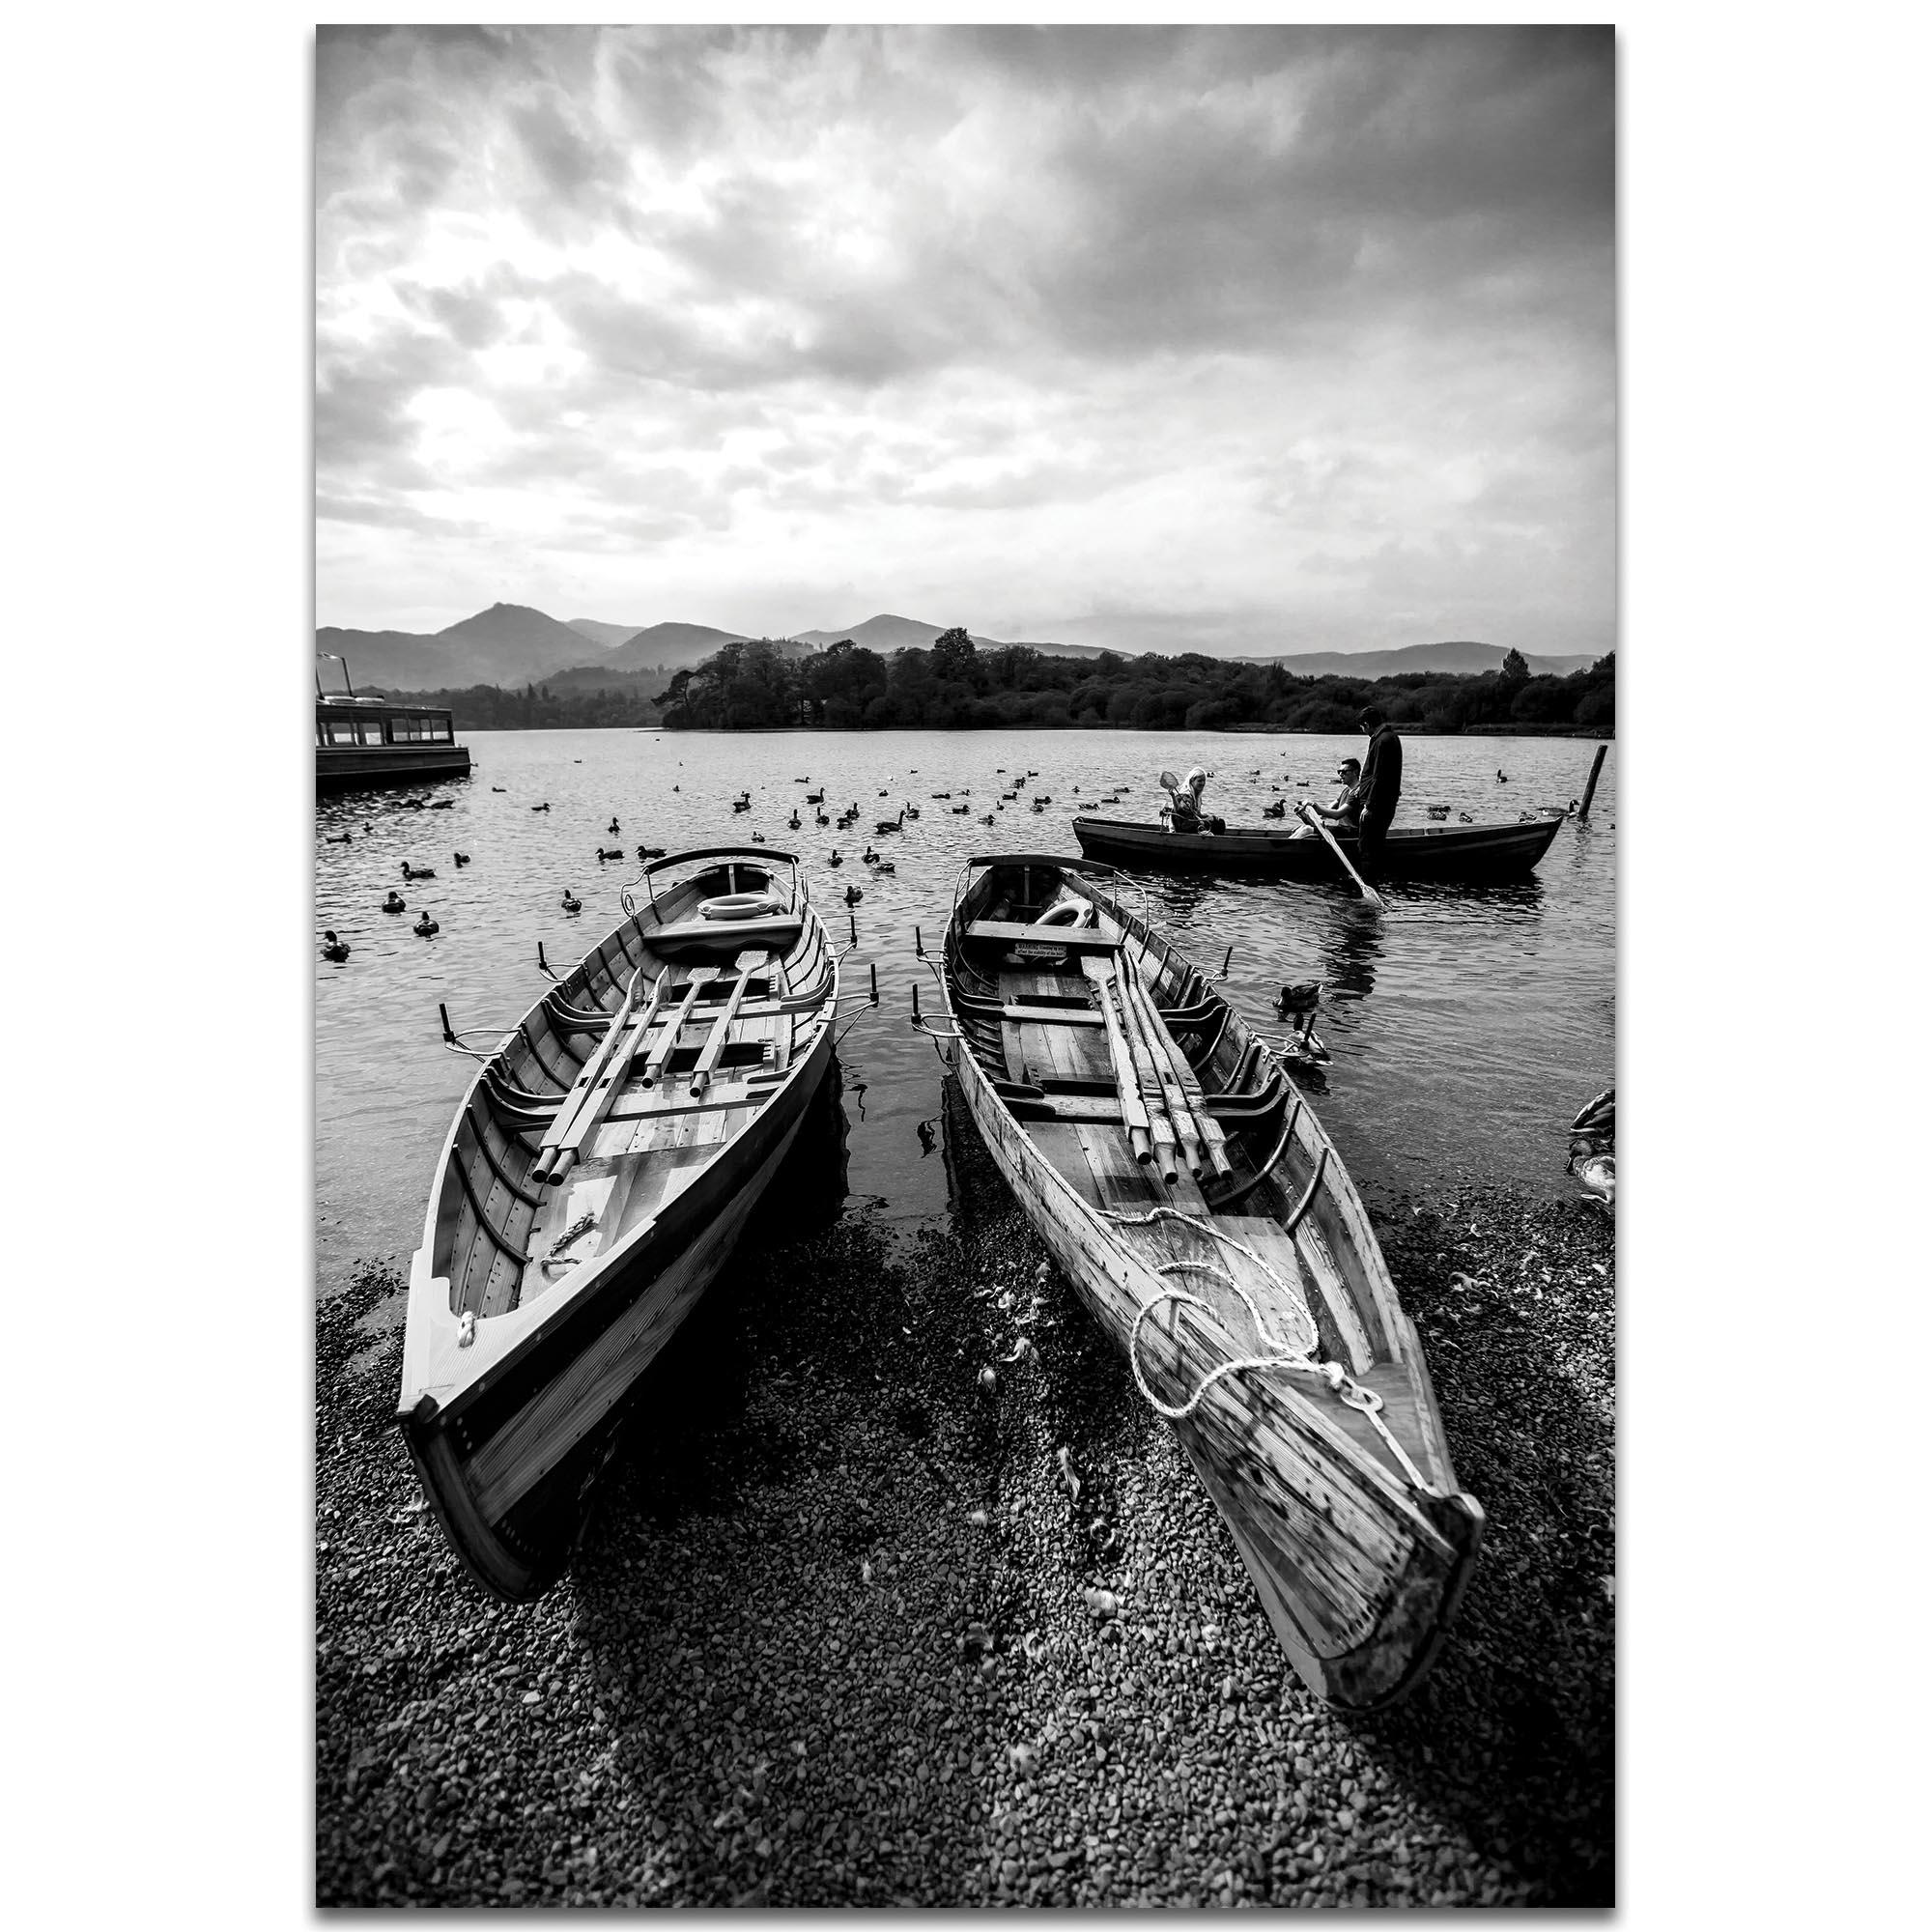 Black & White Photography 'Old Rowboats' - Coastal Art on Metal or Plexiglass